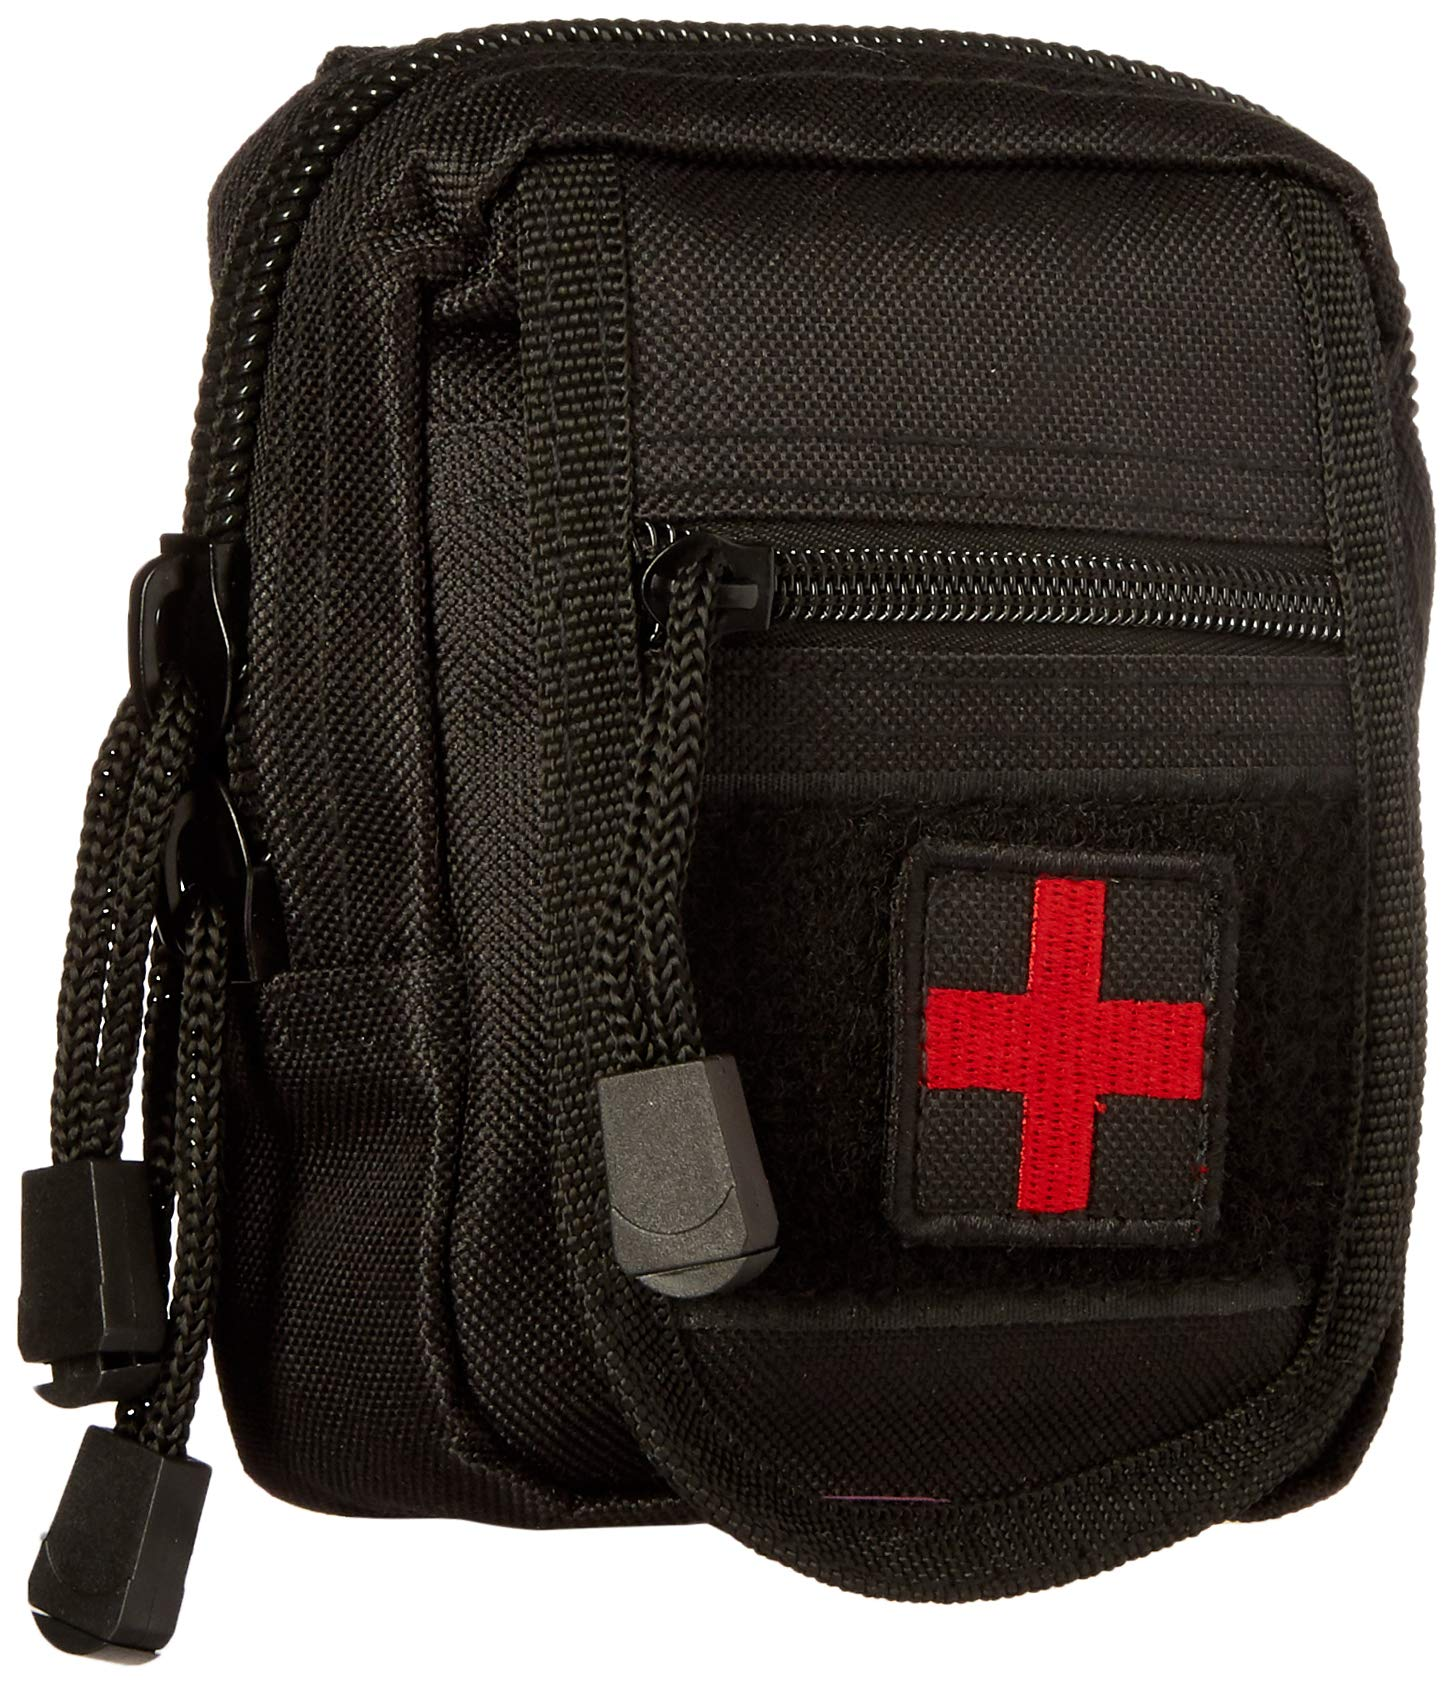 NcStar Compact Trauma Kit 1 Black